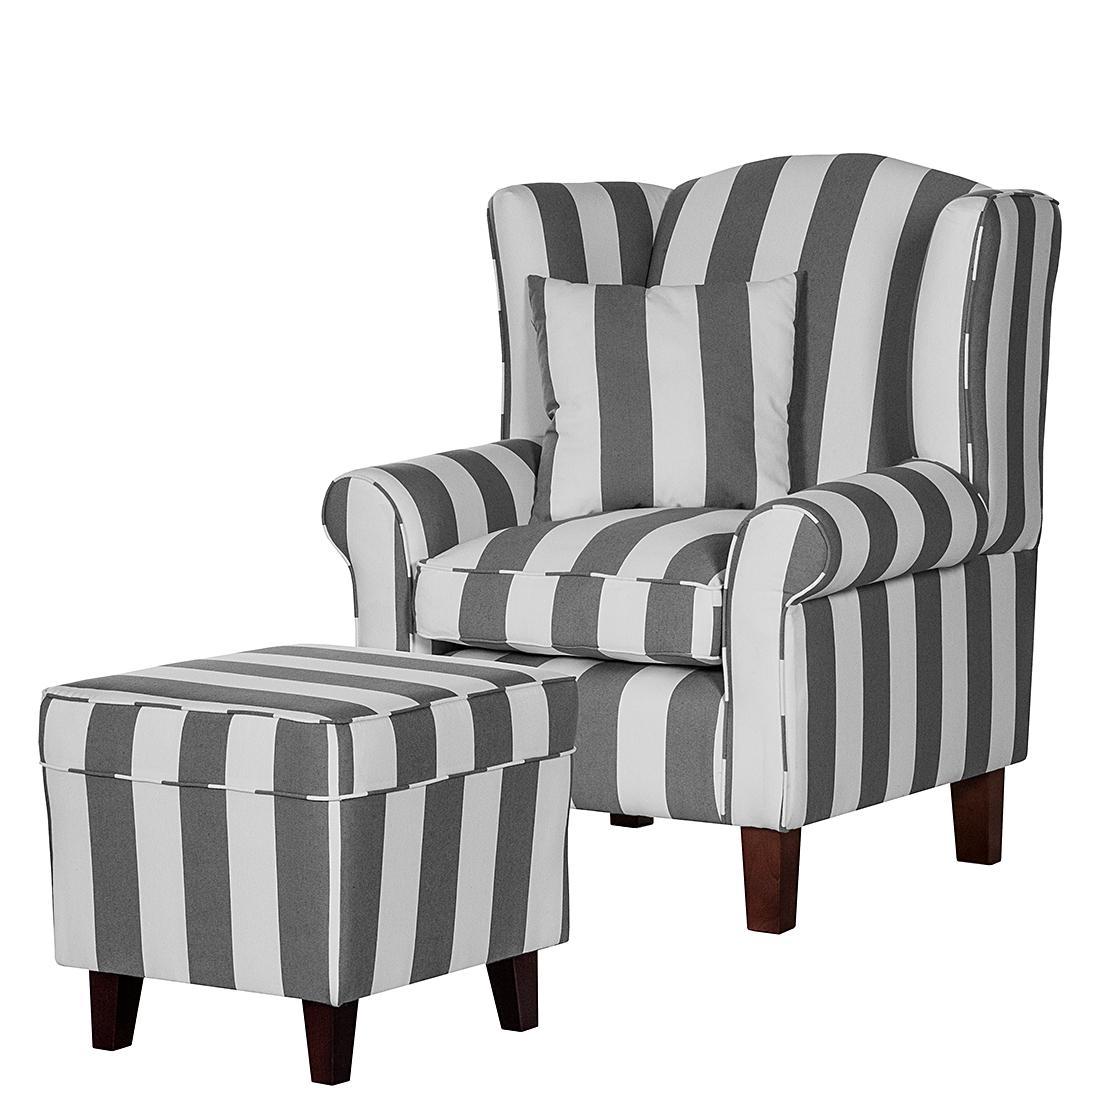 sessel colmar webstoff grau gestreift mit hocker armsessel. Black Bedroom Furniture Sets. Home Design Ideas